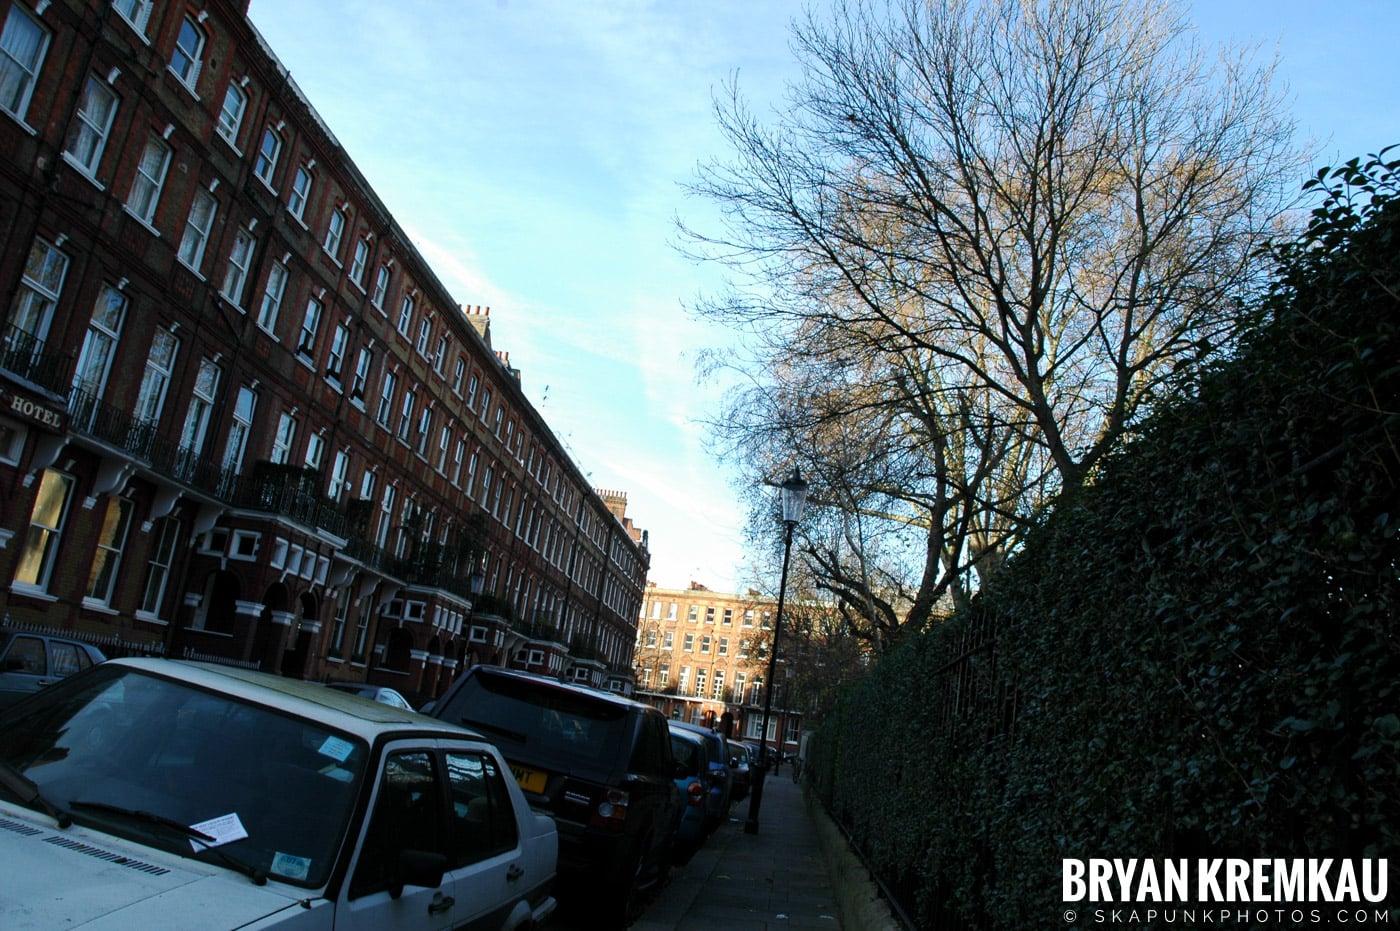 London, England - Day 2 - 12.17.05 (23)